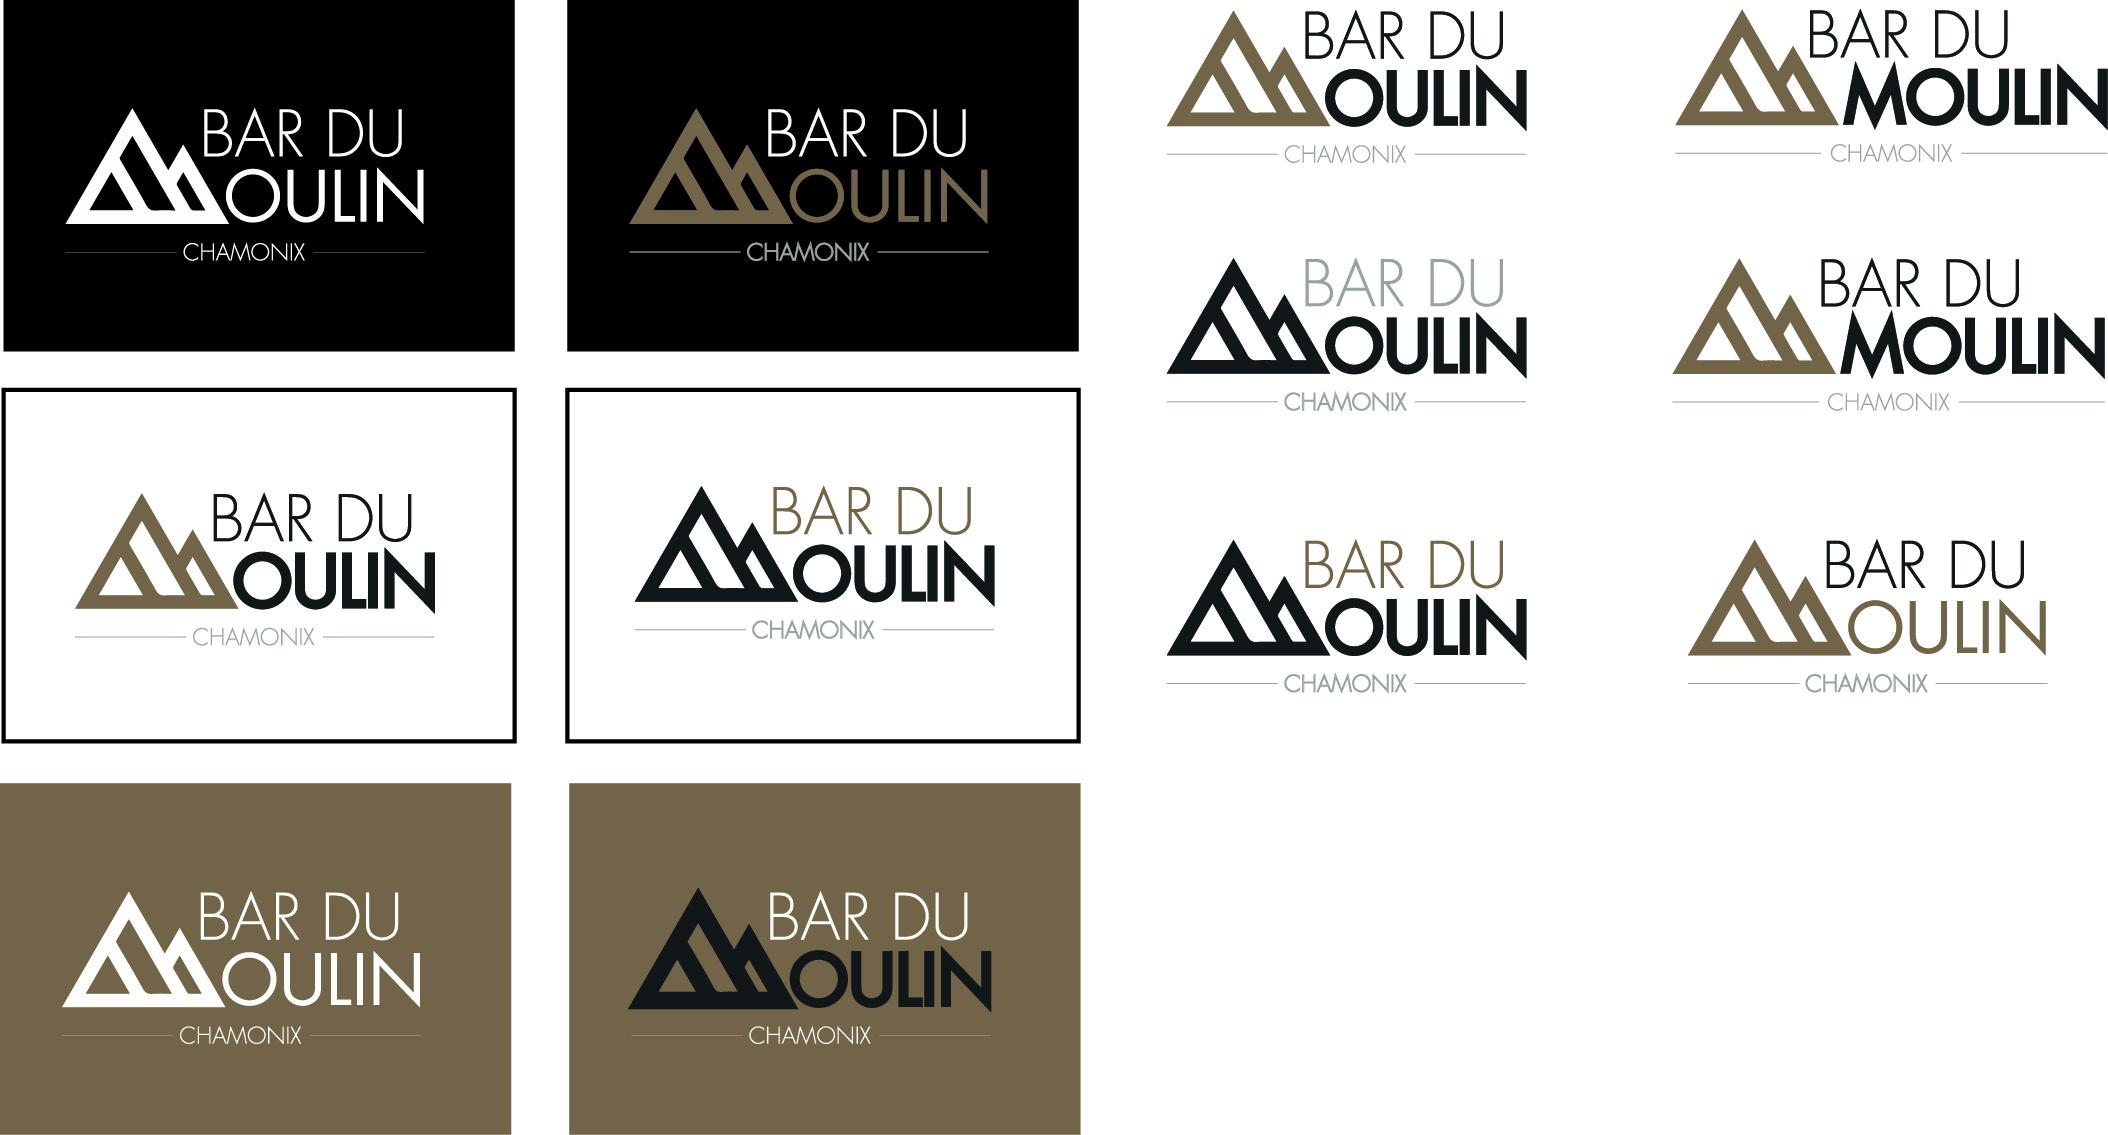 logo_planche1_Bar_Du_Moulin_Chamonix_2016_09_28